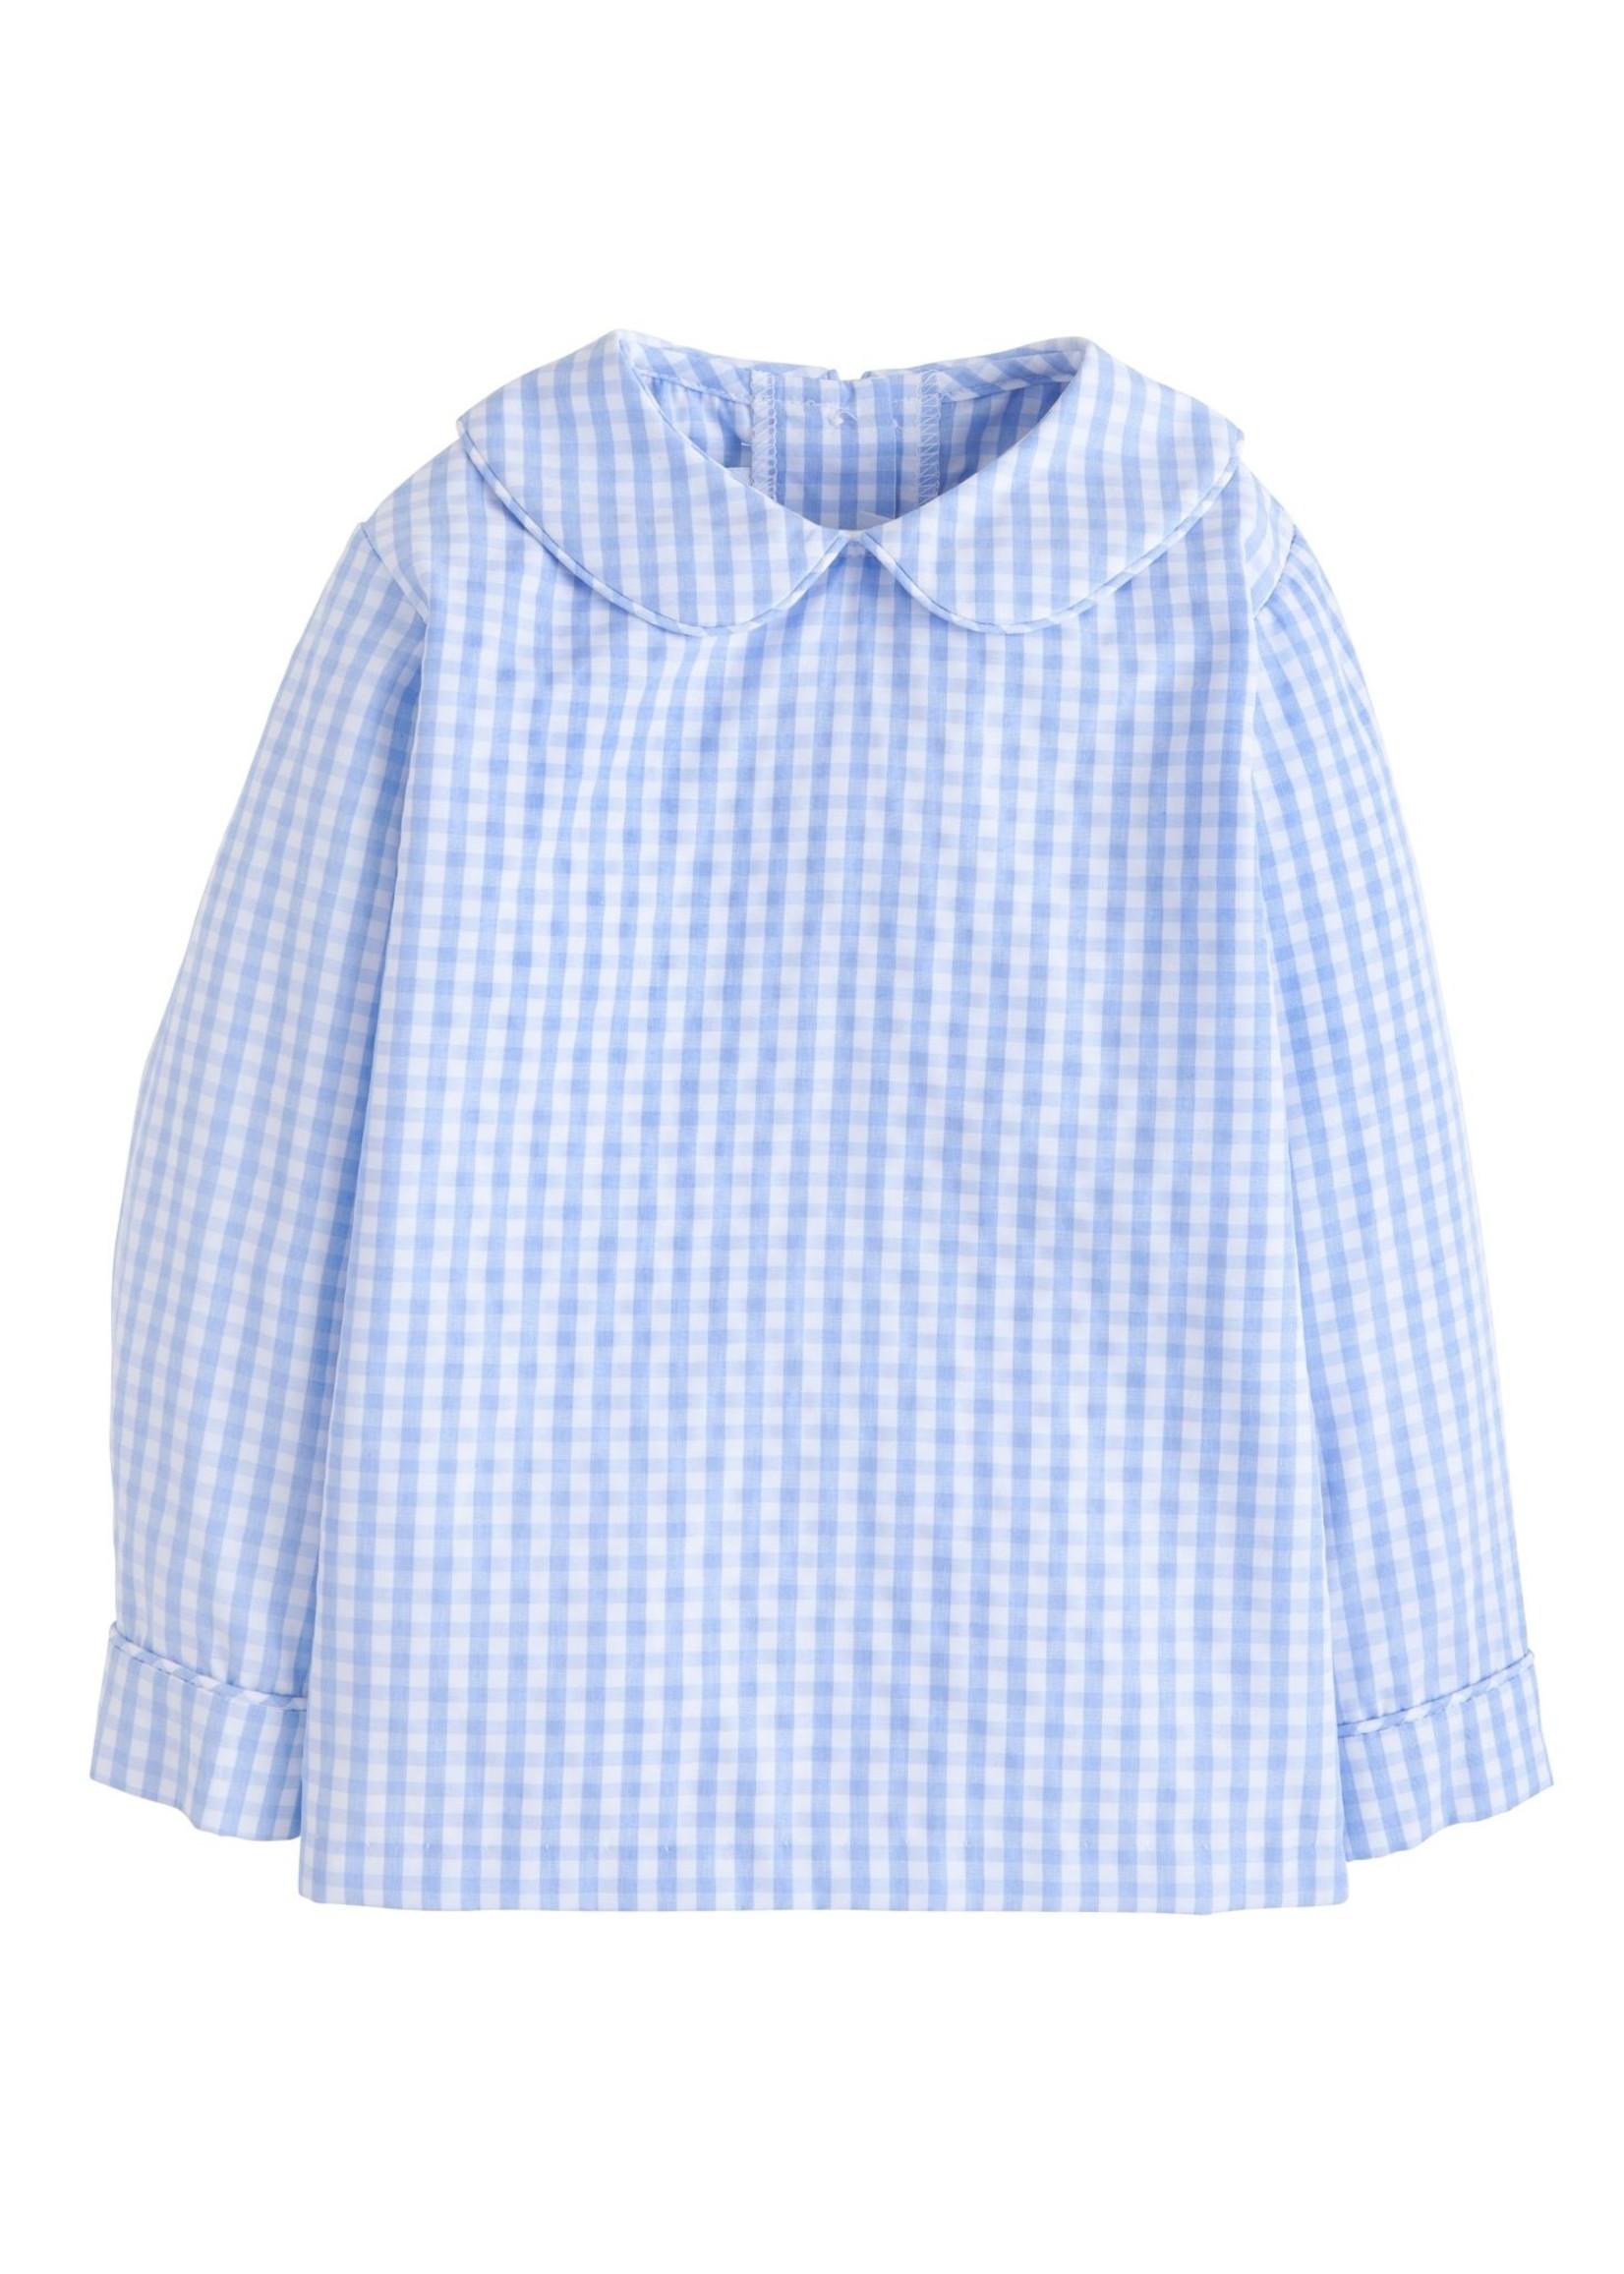 Little English Plaid Peter Pan Shirt - Airy Blue Plaid